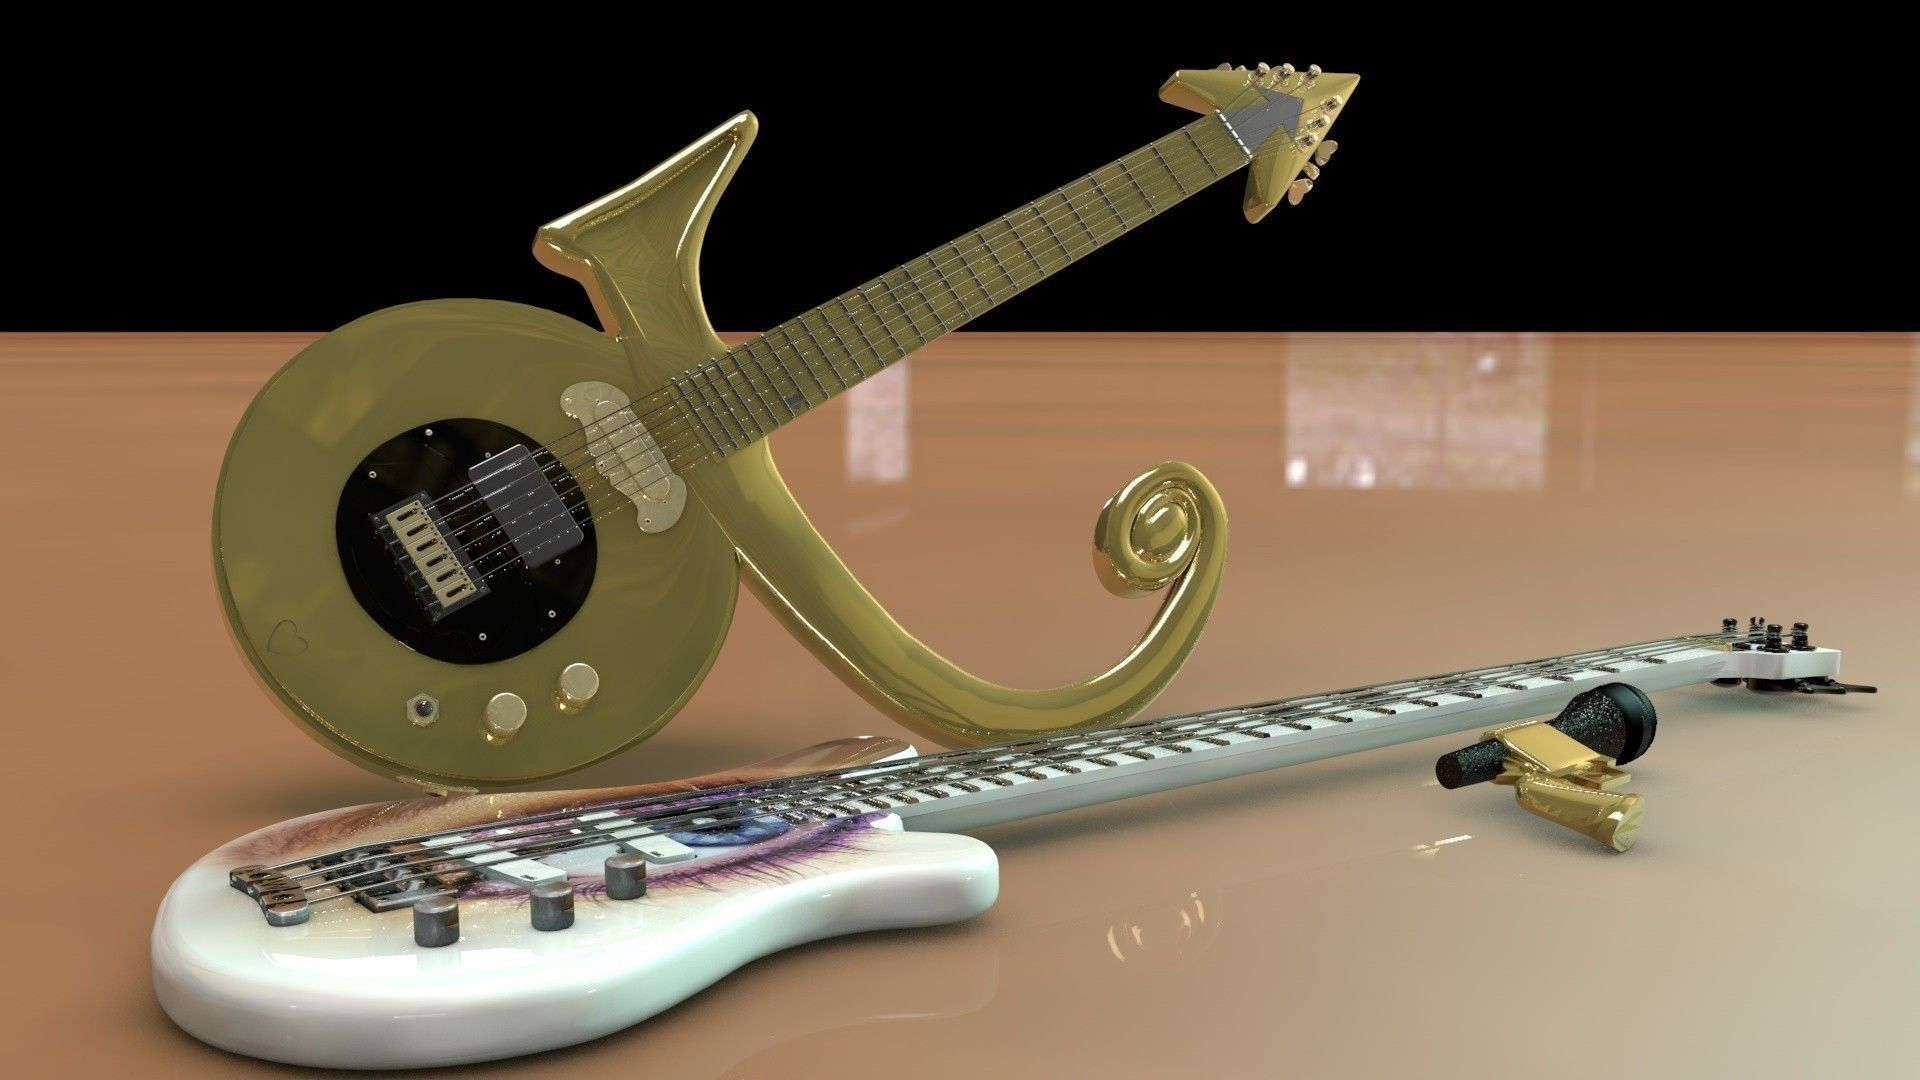 Gun 3d model prince symbol guitar and eye bass cgtrader prince symbol guitar and eye bass 3d model obj 3ds fbx c4d dxf stl 4 buycottarizona